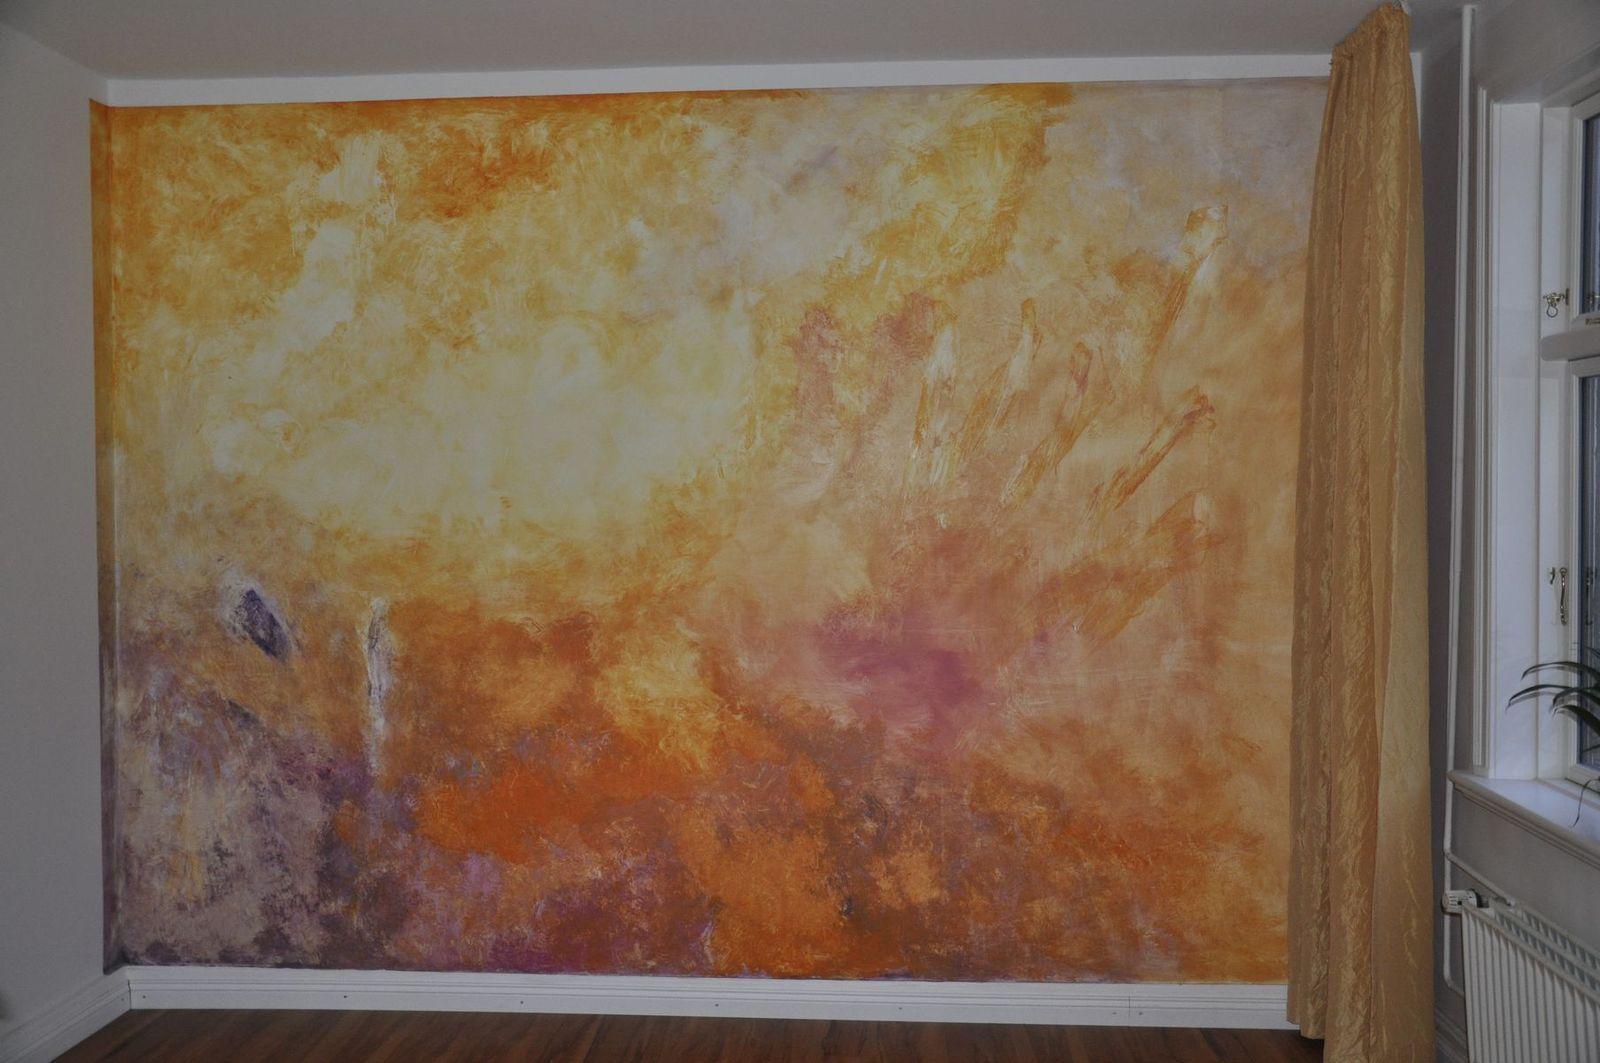 Abstrakte Wandmalerei - Wischtechnik